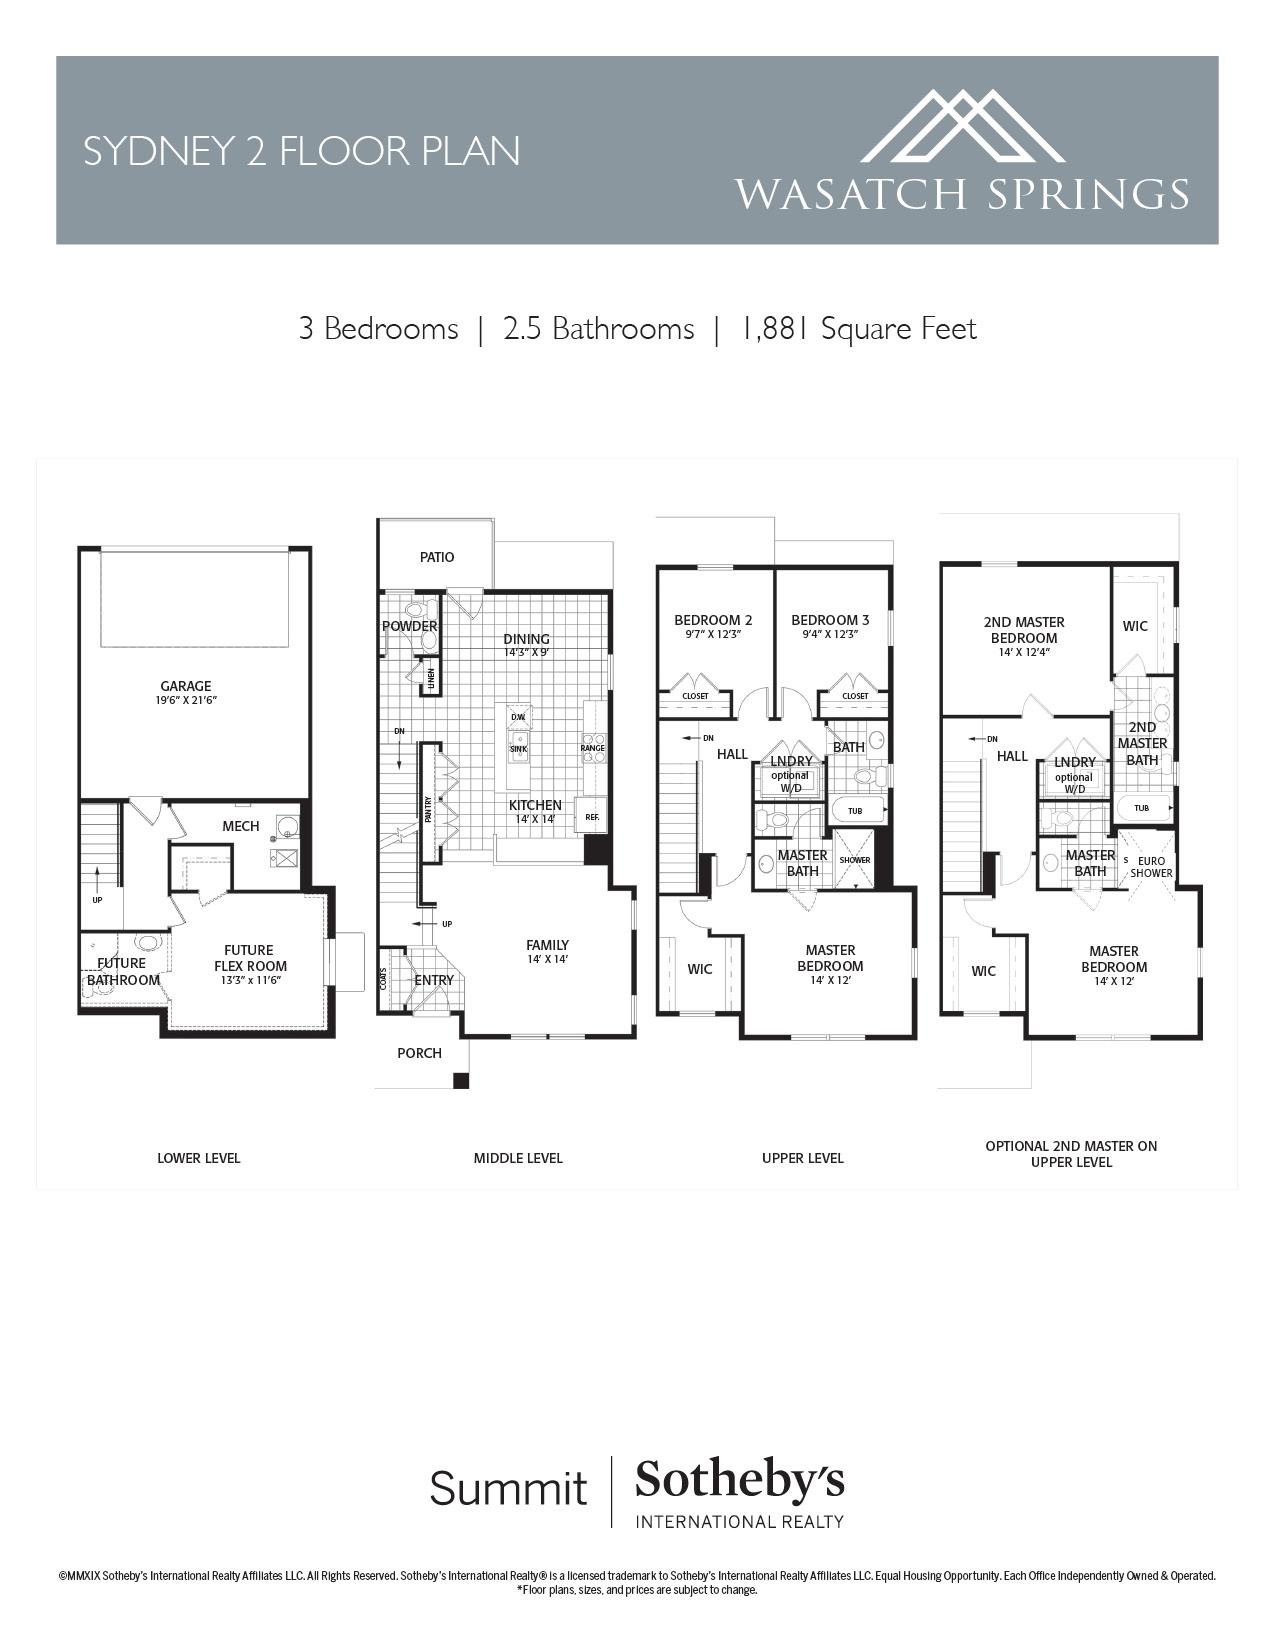 Sydney 2 Floor Plan.jpg